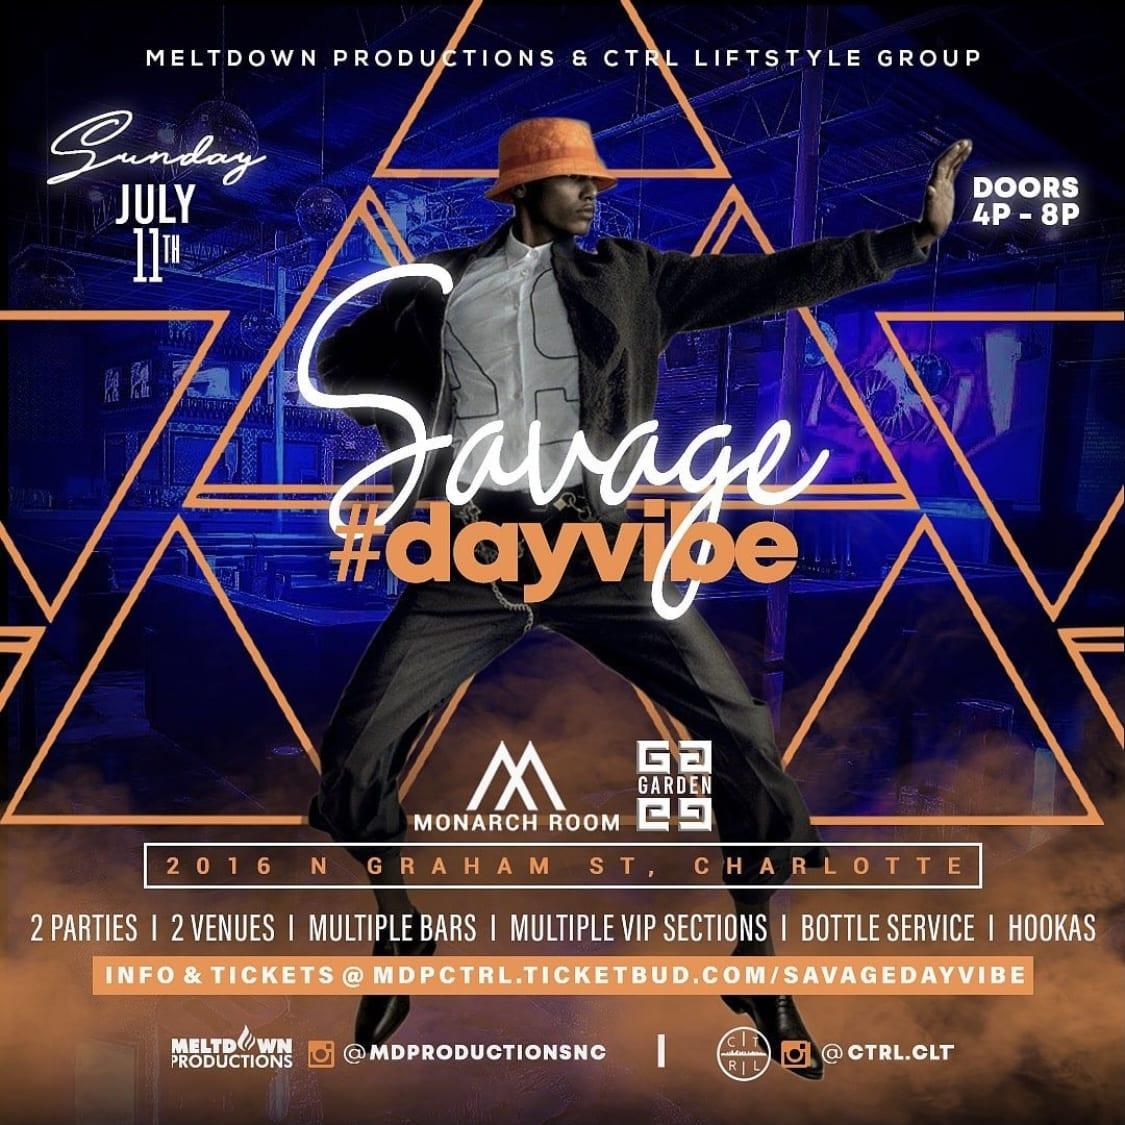 Savage #dayvibe